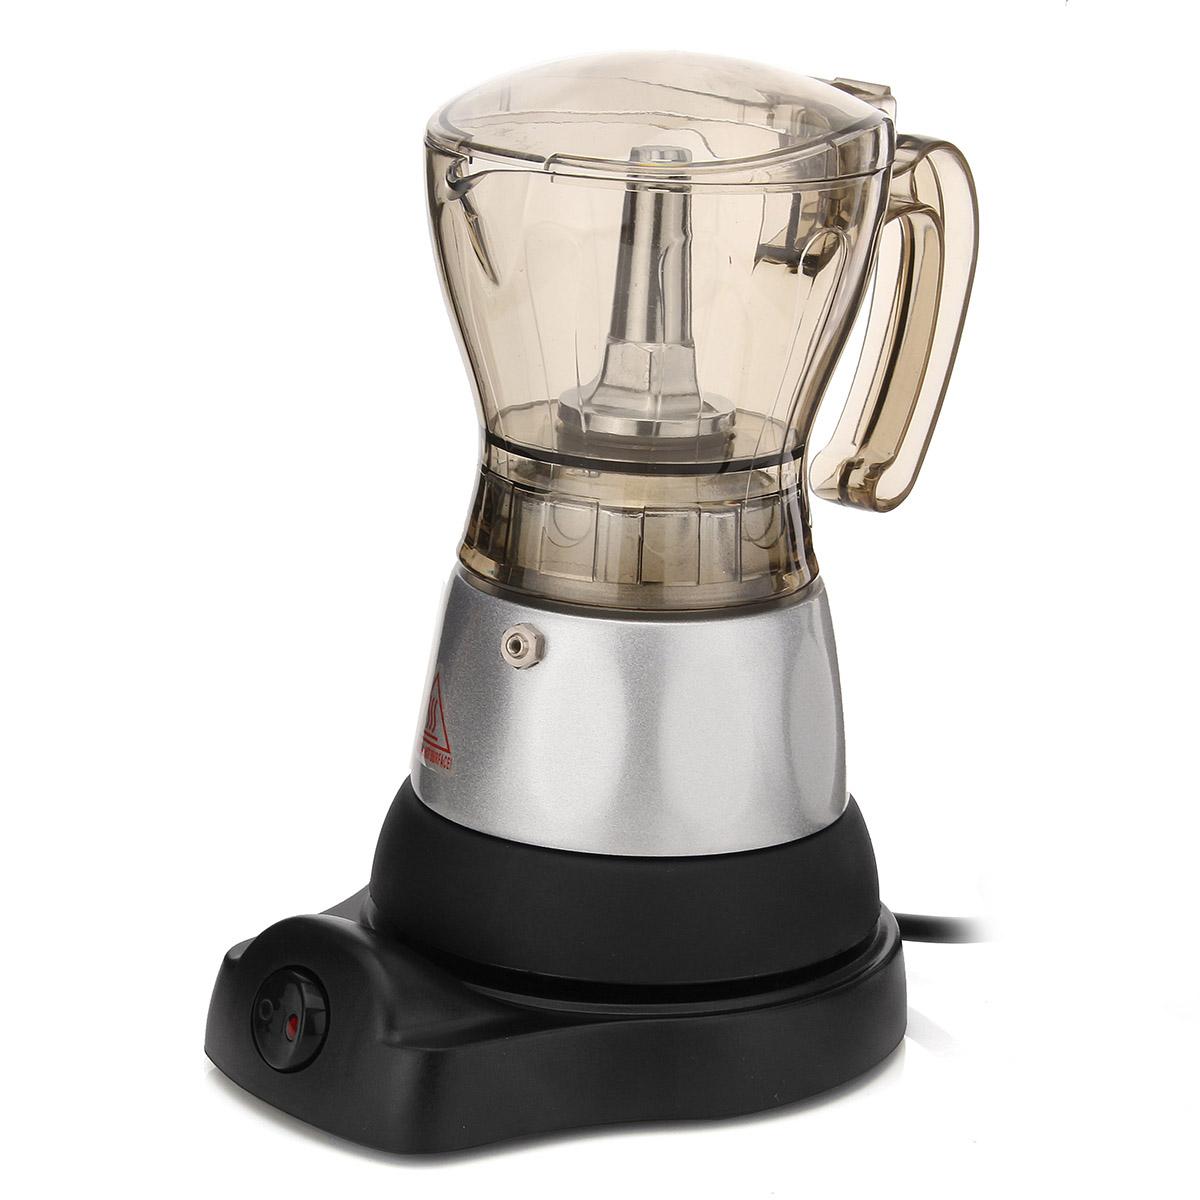 4 Cup Electric Espresso Coffee Maker Machine Percolator Moka Pot Stovetop Brewer 11street ...